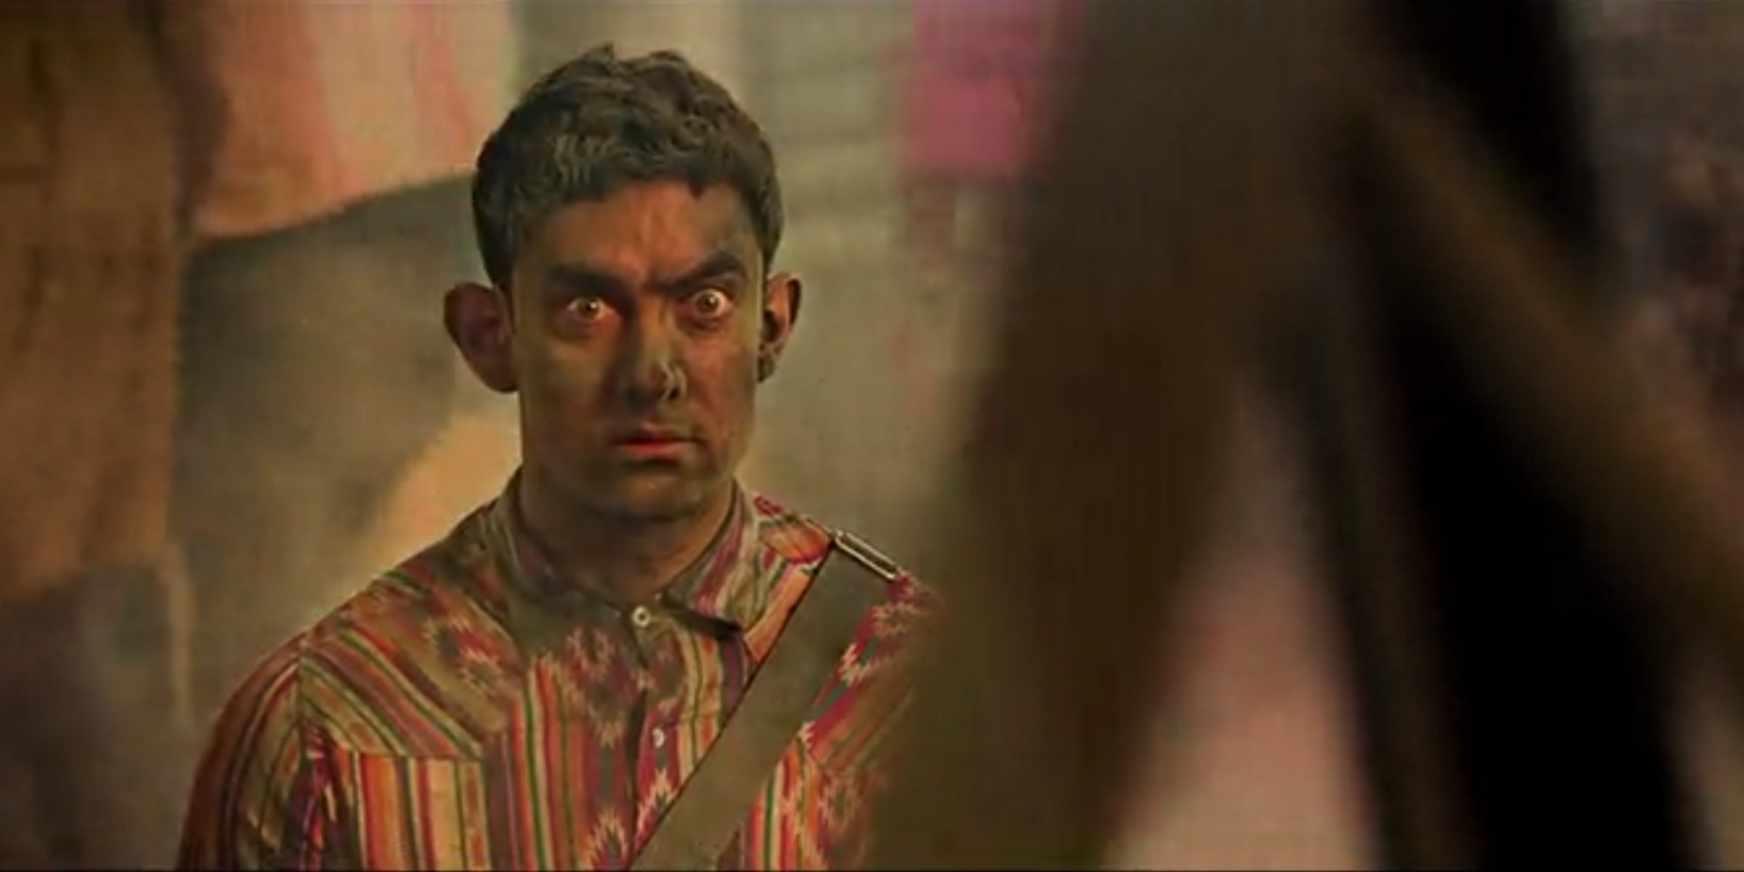 dirty black aamir khan pk scene meme template